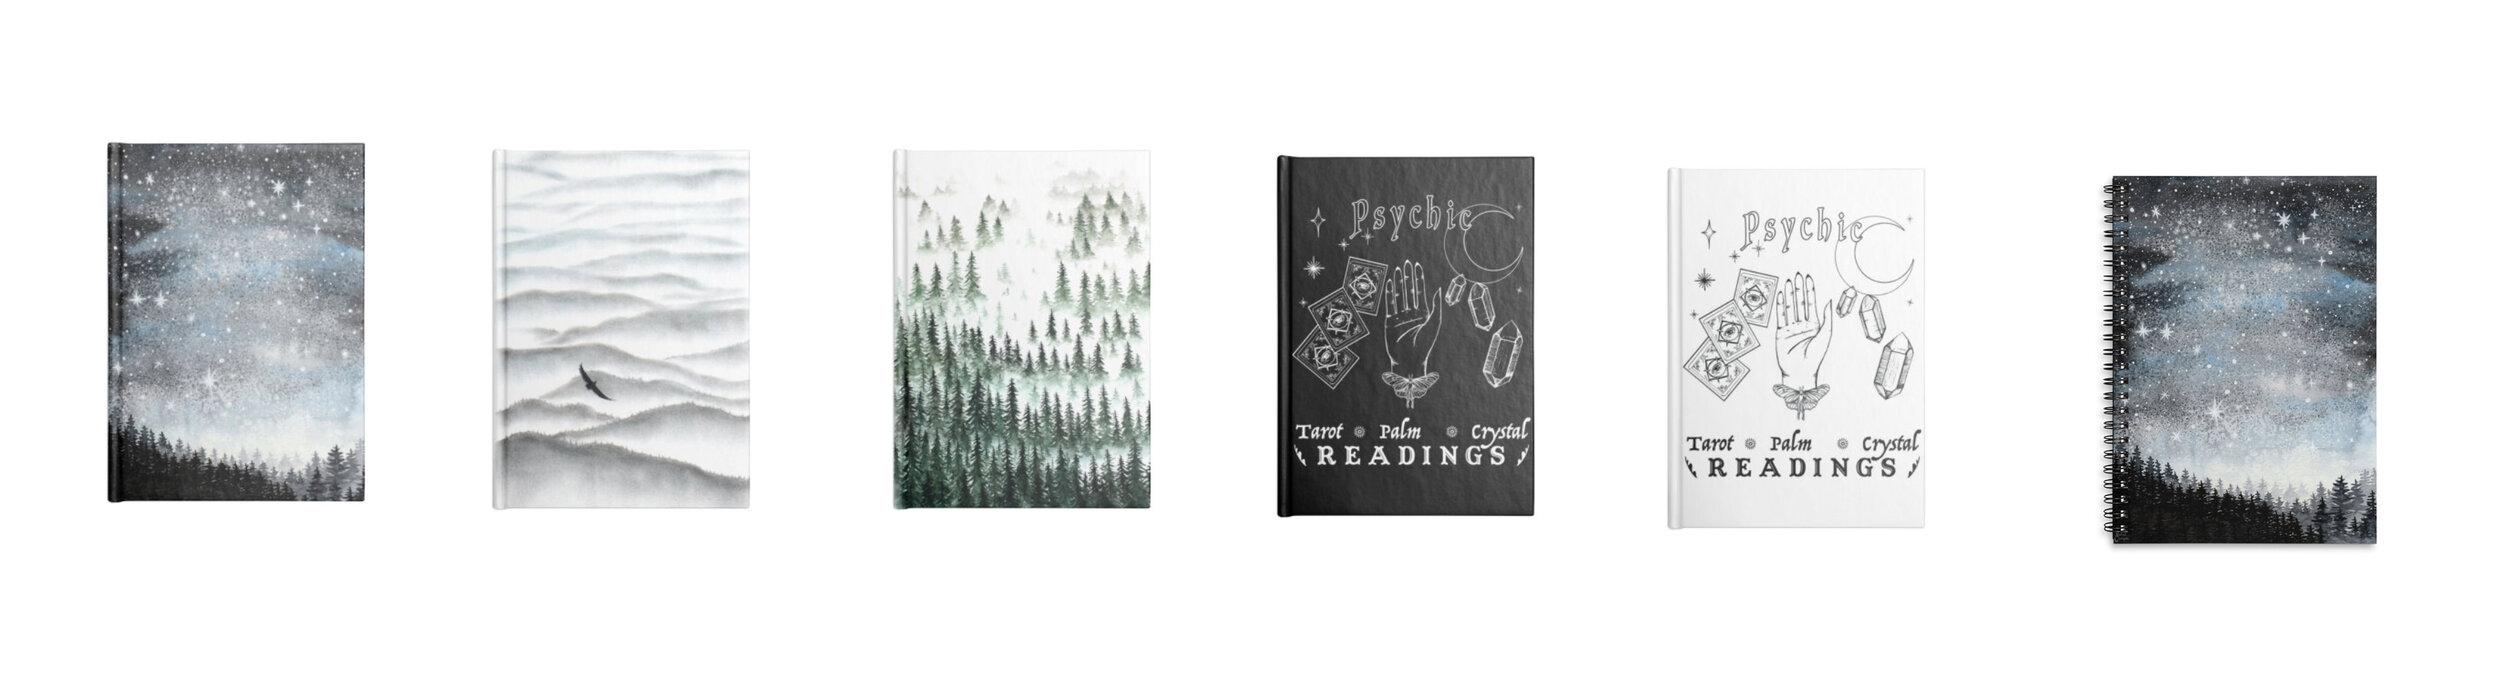 Tree Talker Art Shop Update New Notebooks